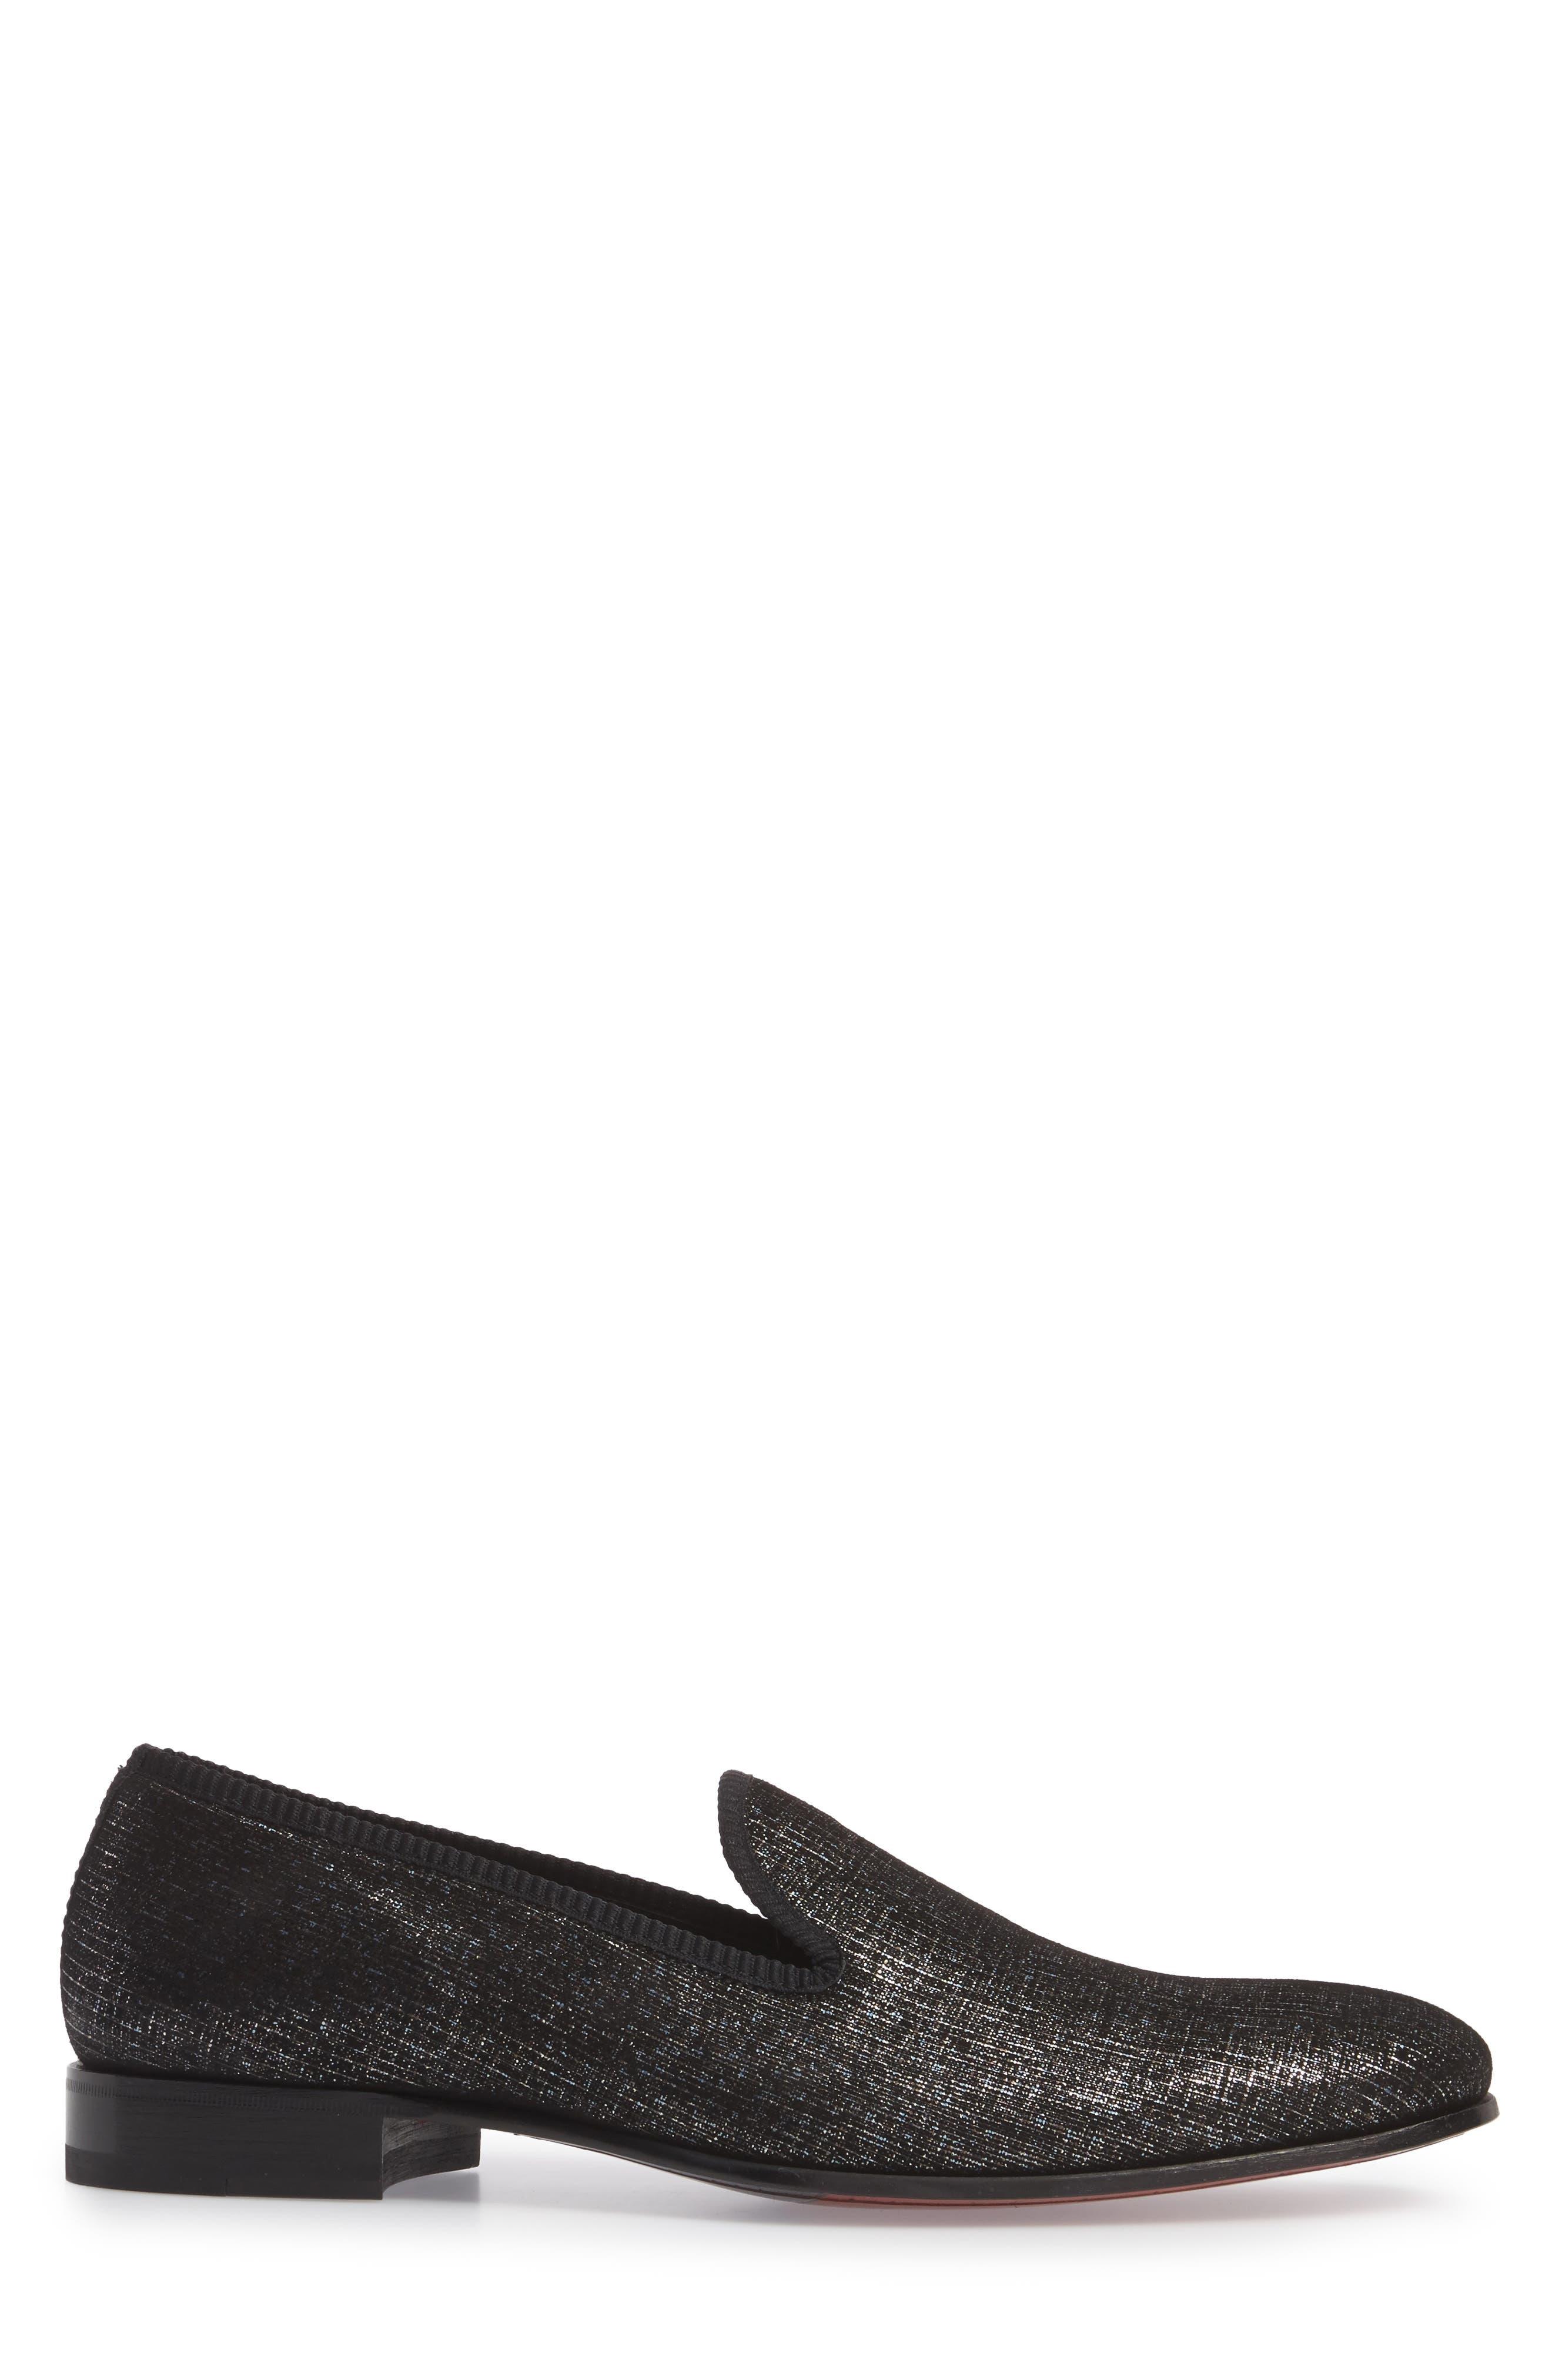 Belona Venetian Loafer,                             Alternate thumbnail 3, color,                             GREY SUEDE